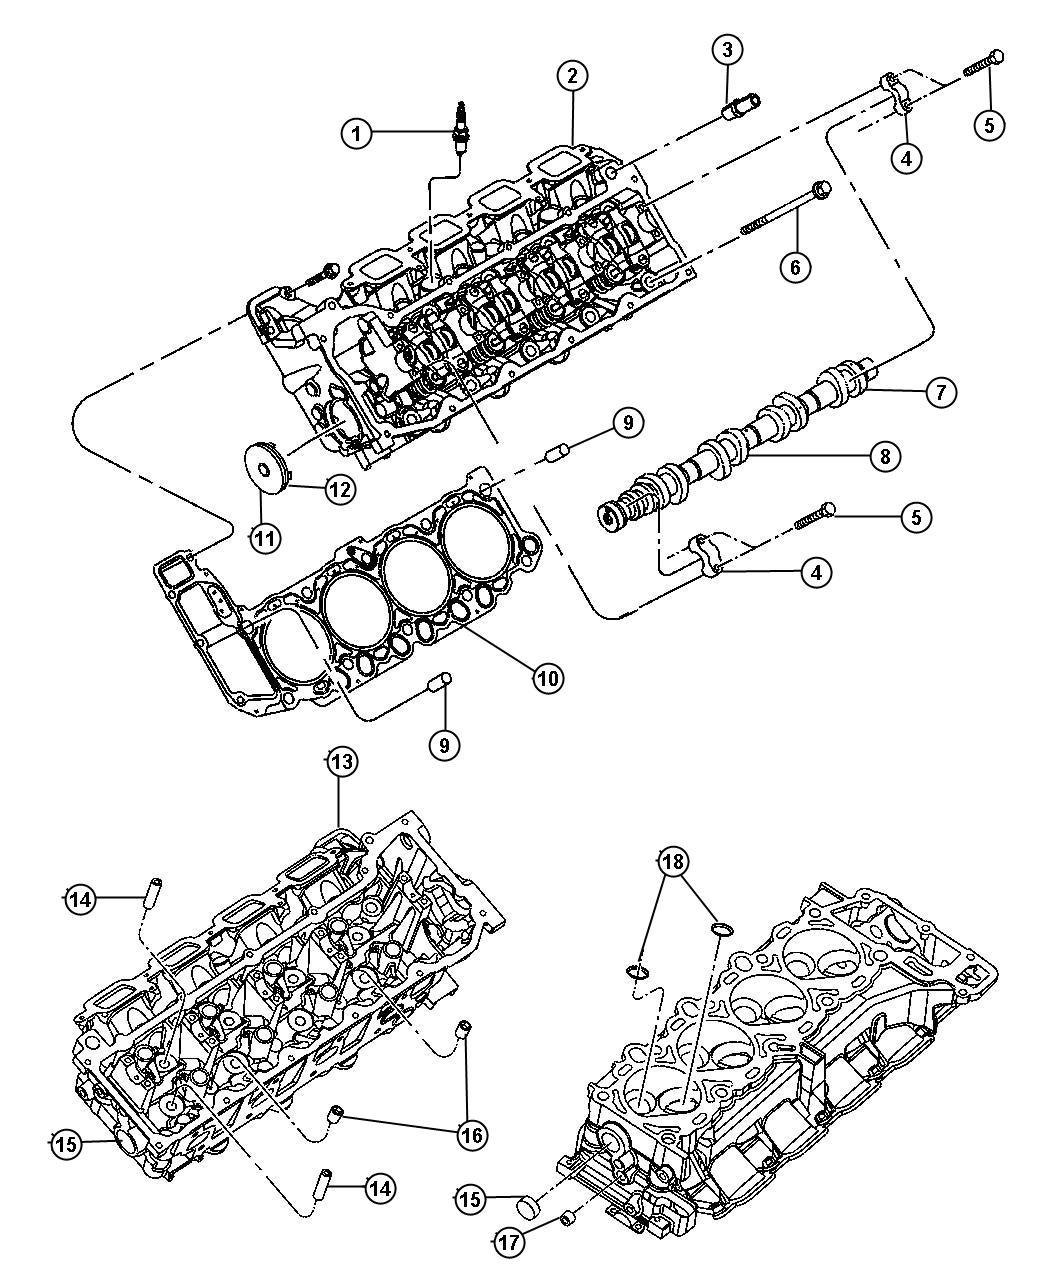 tags: #2000 dodge durango engine diagram#2005 dodge ram 1500 engine diagram#2004  dodge durango engine diagram#1999 dodge dakota engine diagram#dodge ram